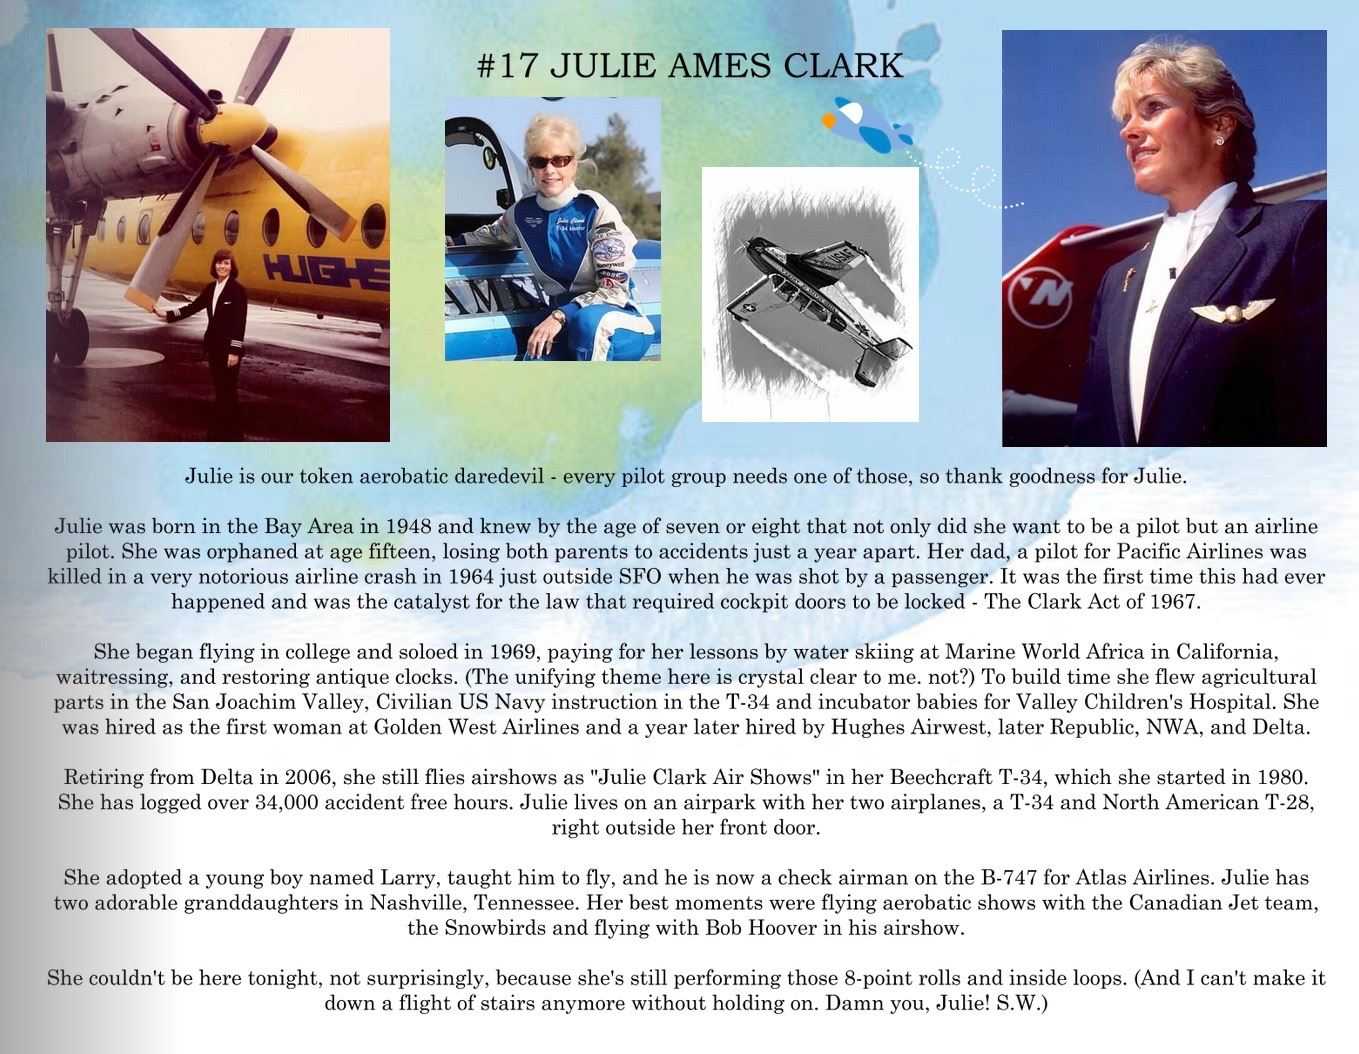 17. Julie Ames Clark